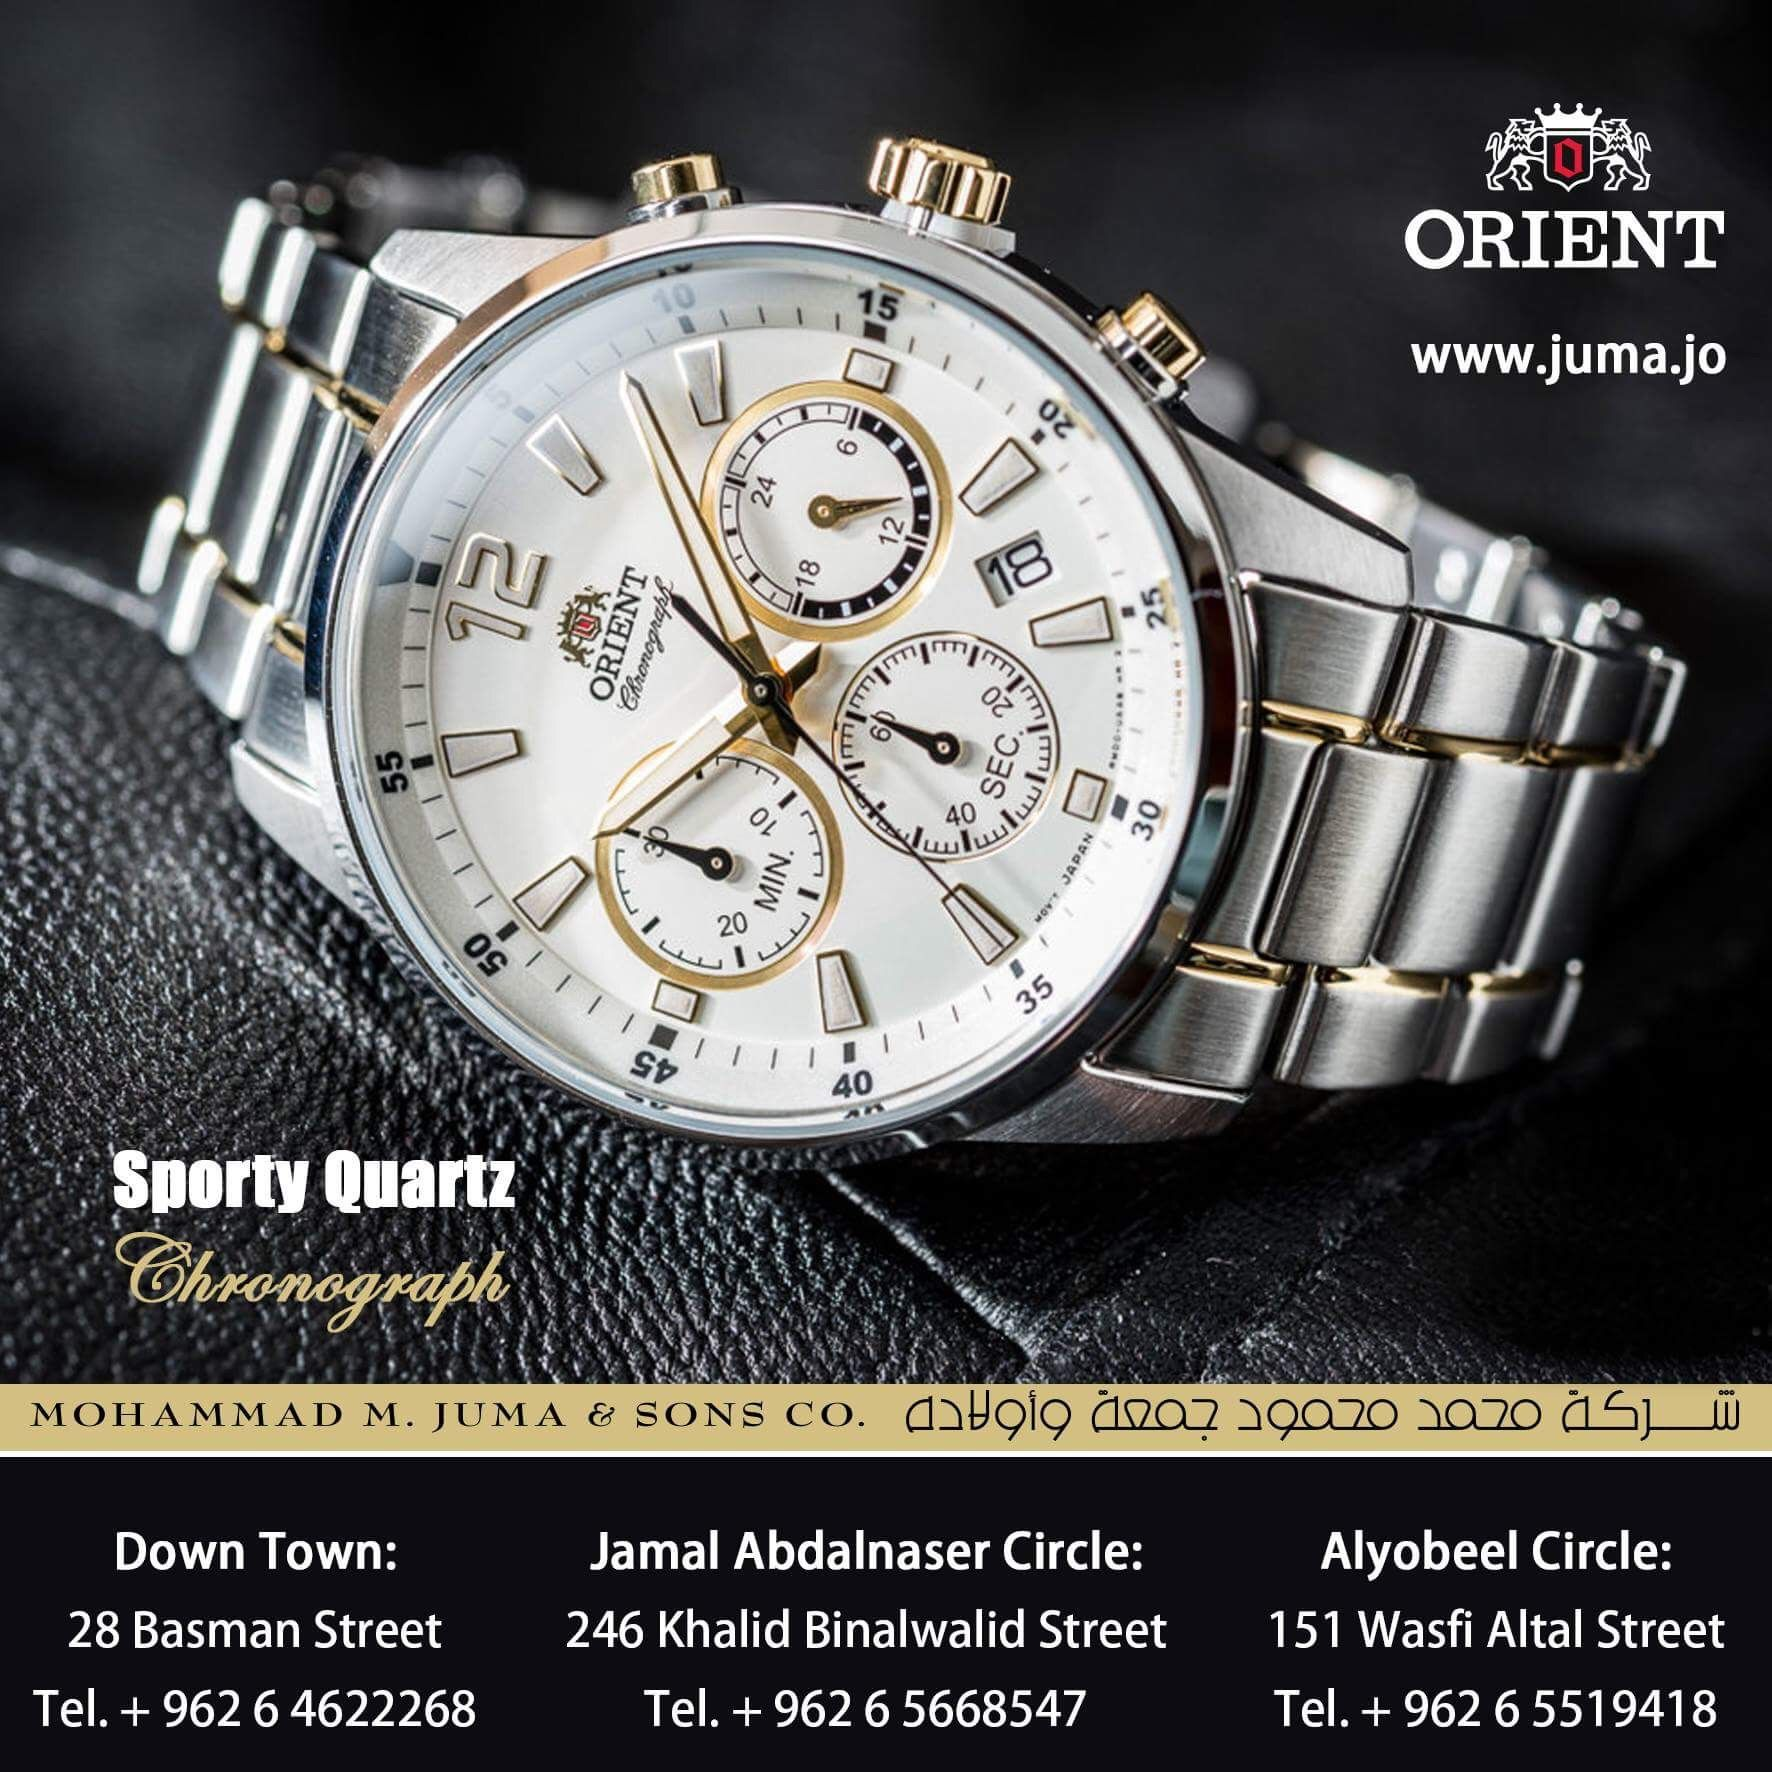 Pin By Fredi Sugianto On Watches Orient Watch Quartz Watch Wrist Watch